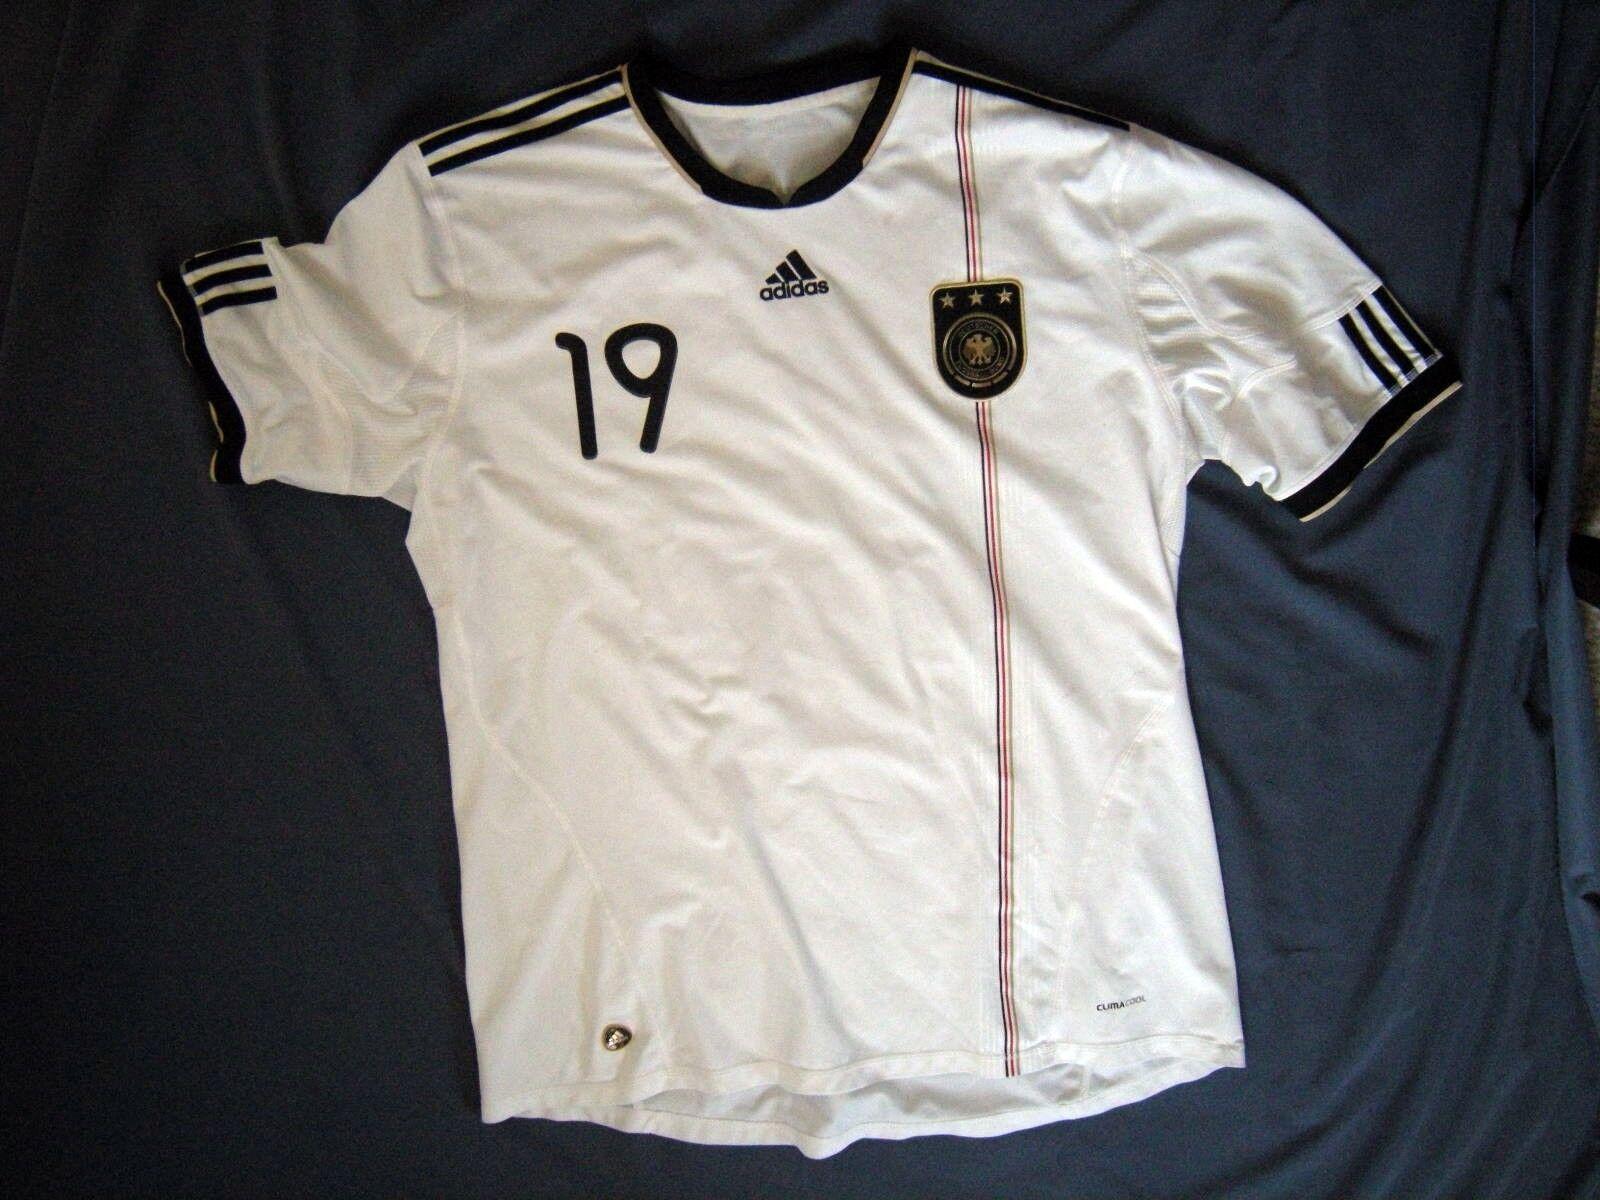 DFB-Trikot Deutschland WM 2010 2010 2010 - Nr. 19 Cacau Orig. signiert - Adidas 3XL 681b8b